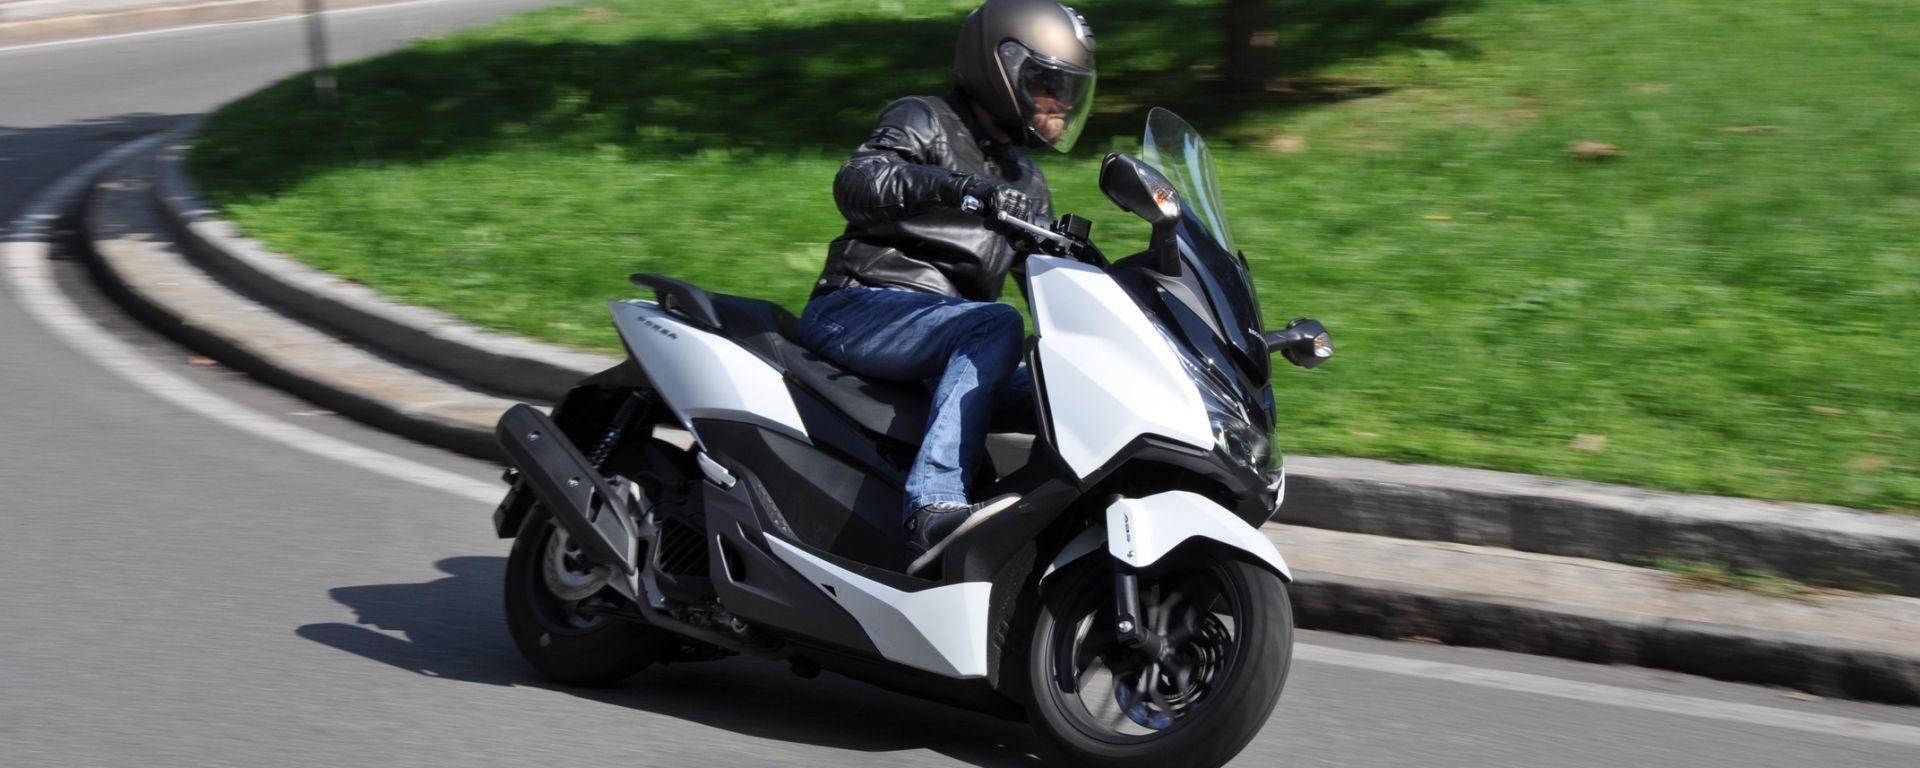 Test Ride Honda Forza 125 Abs Motorbox